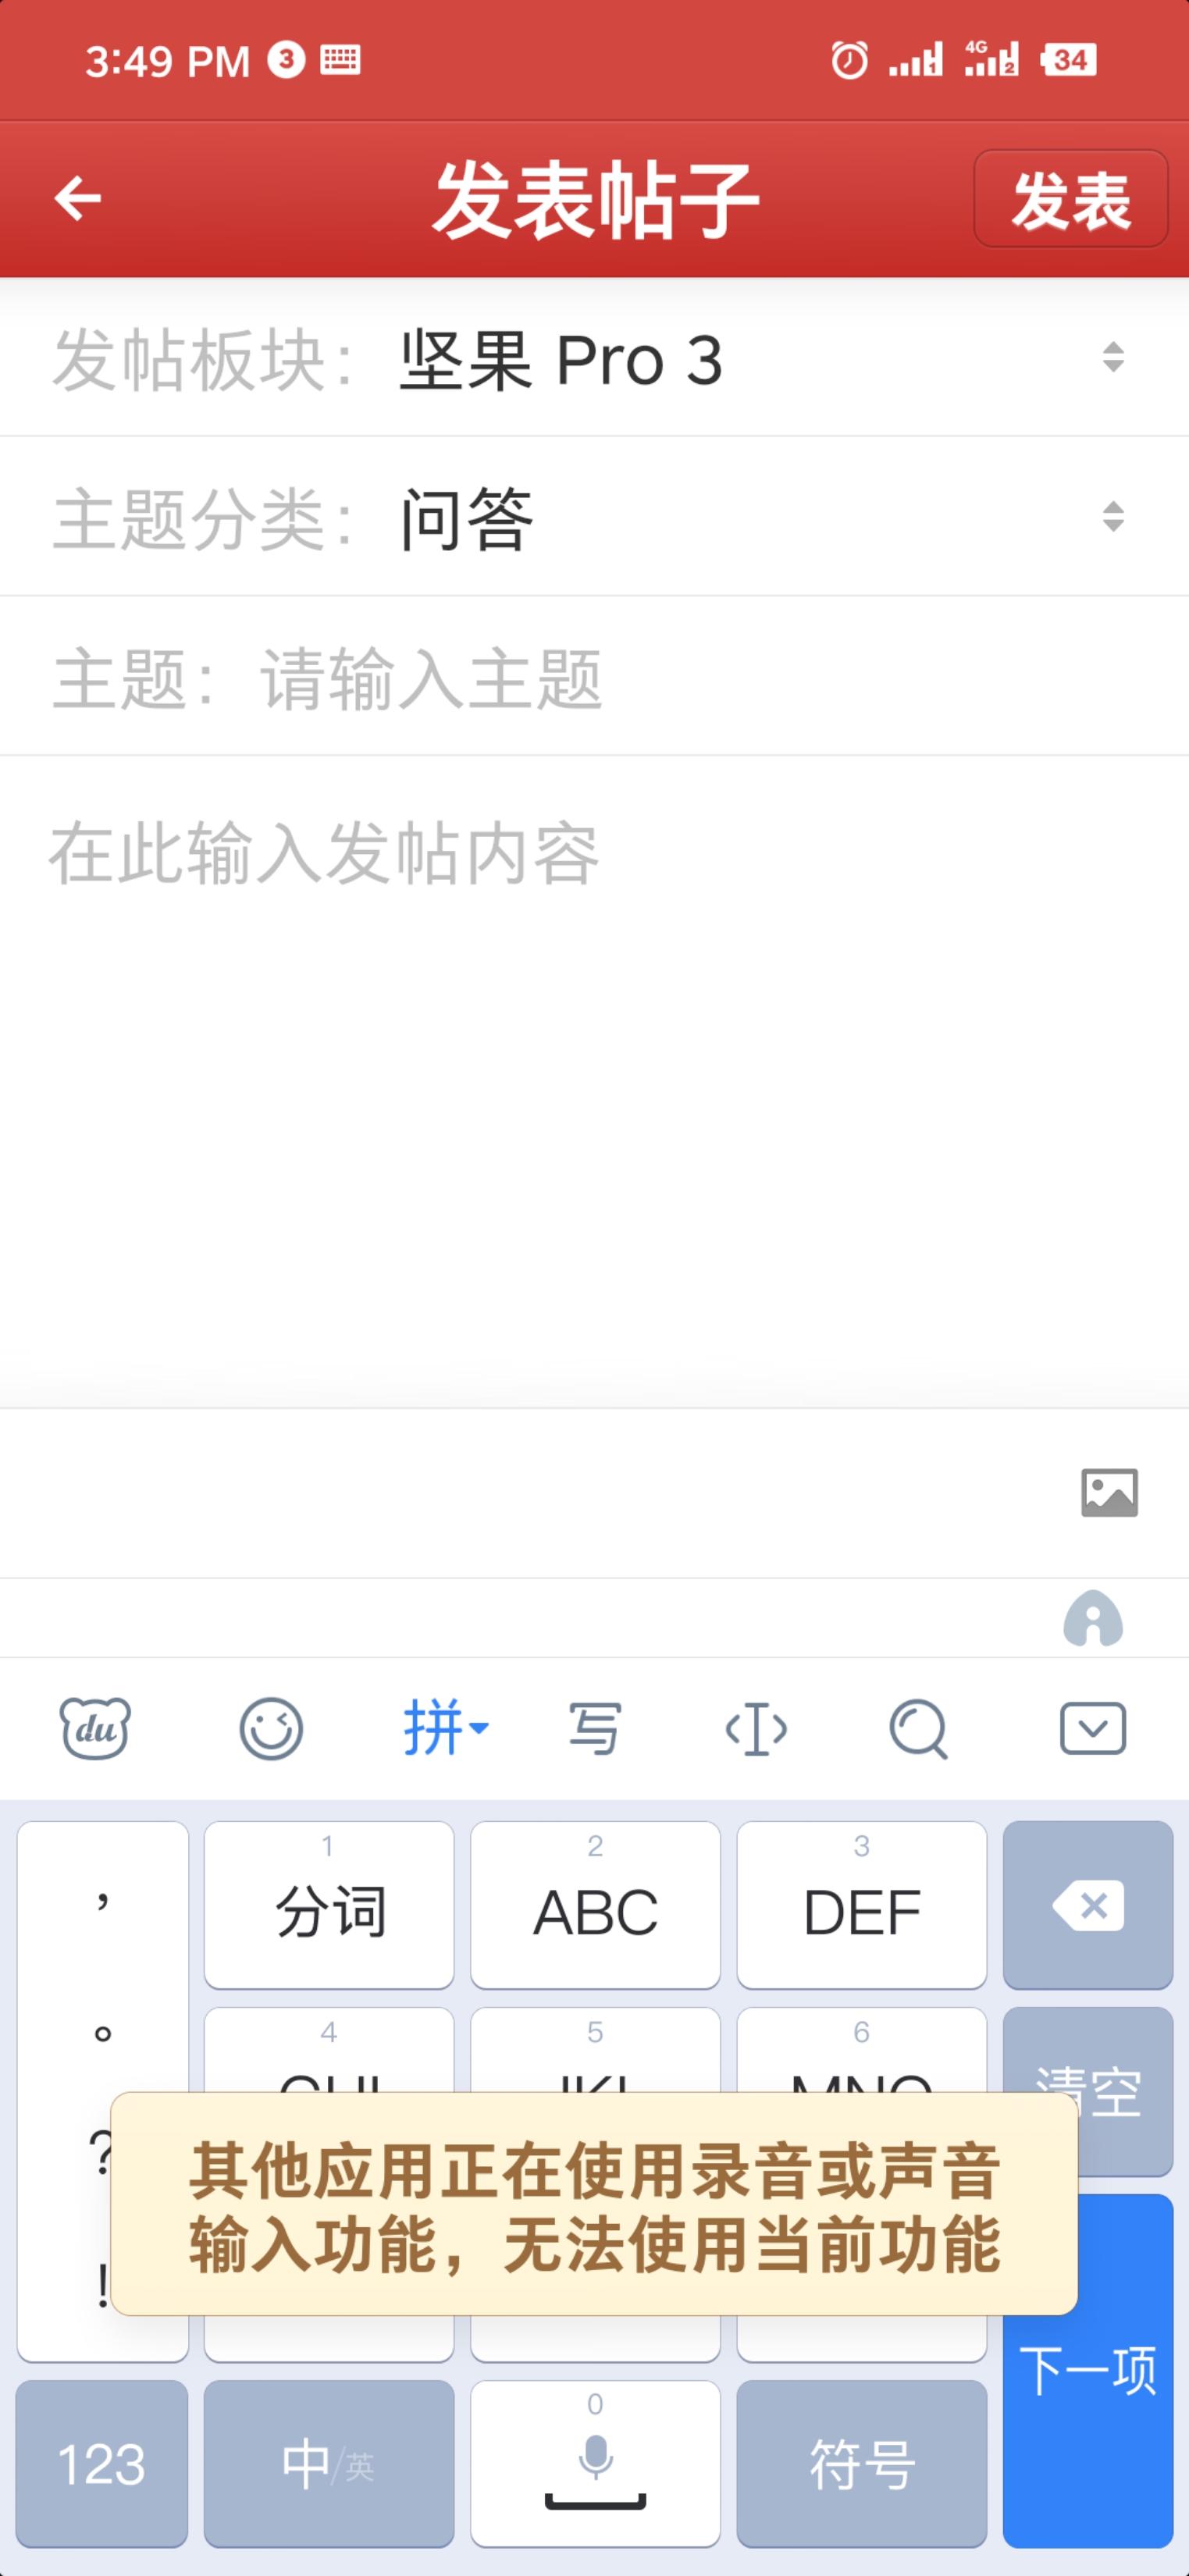 Screenshot_2021-05-06-15-49-30-568_??????.png